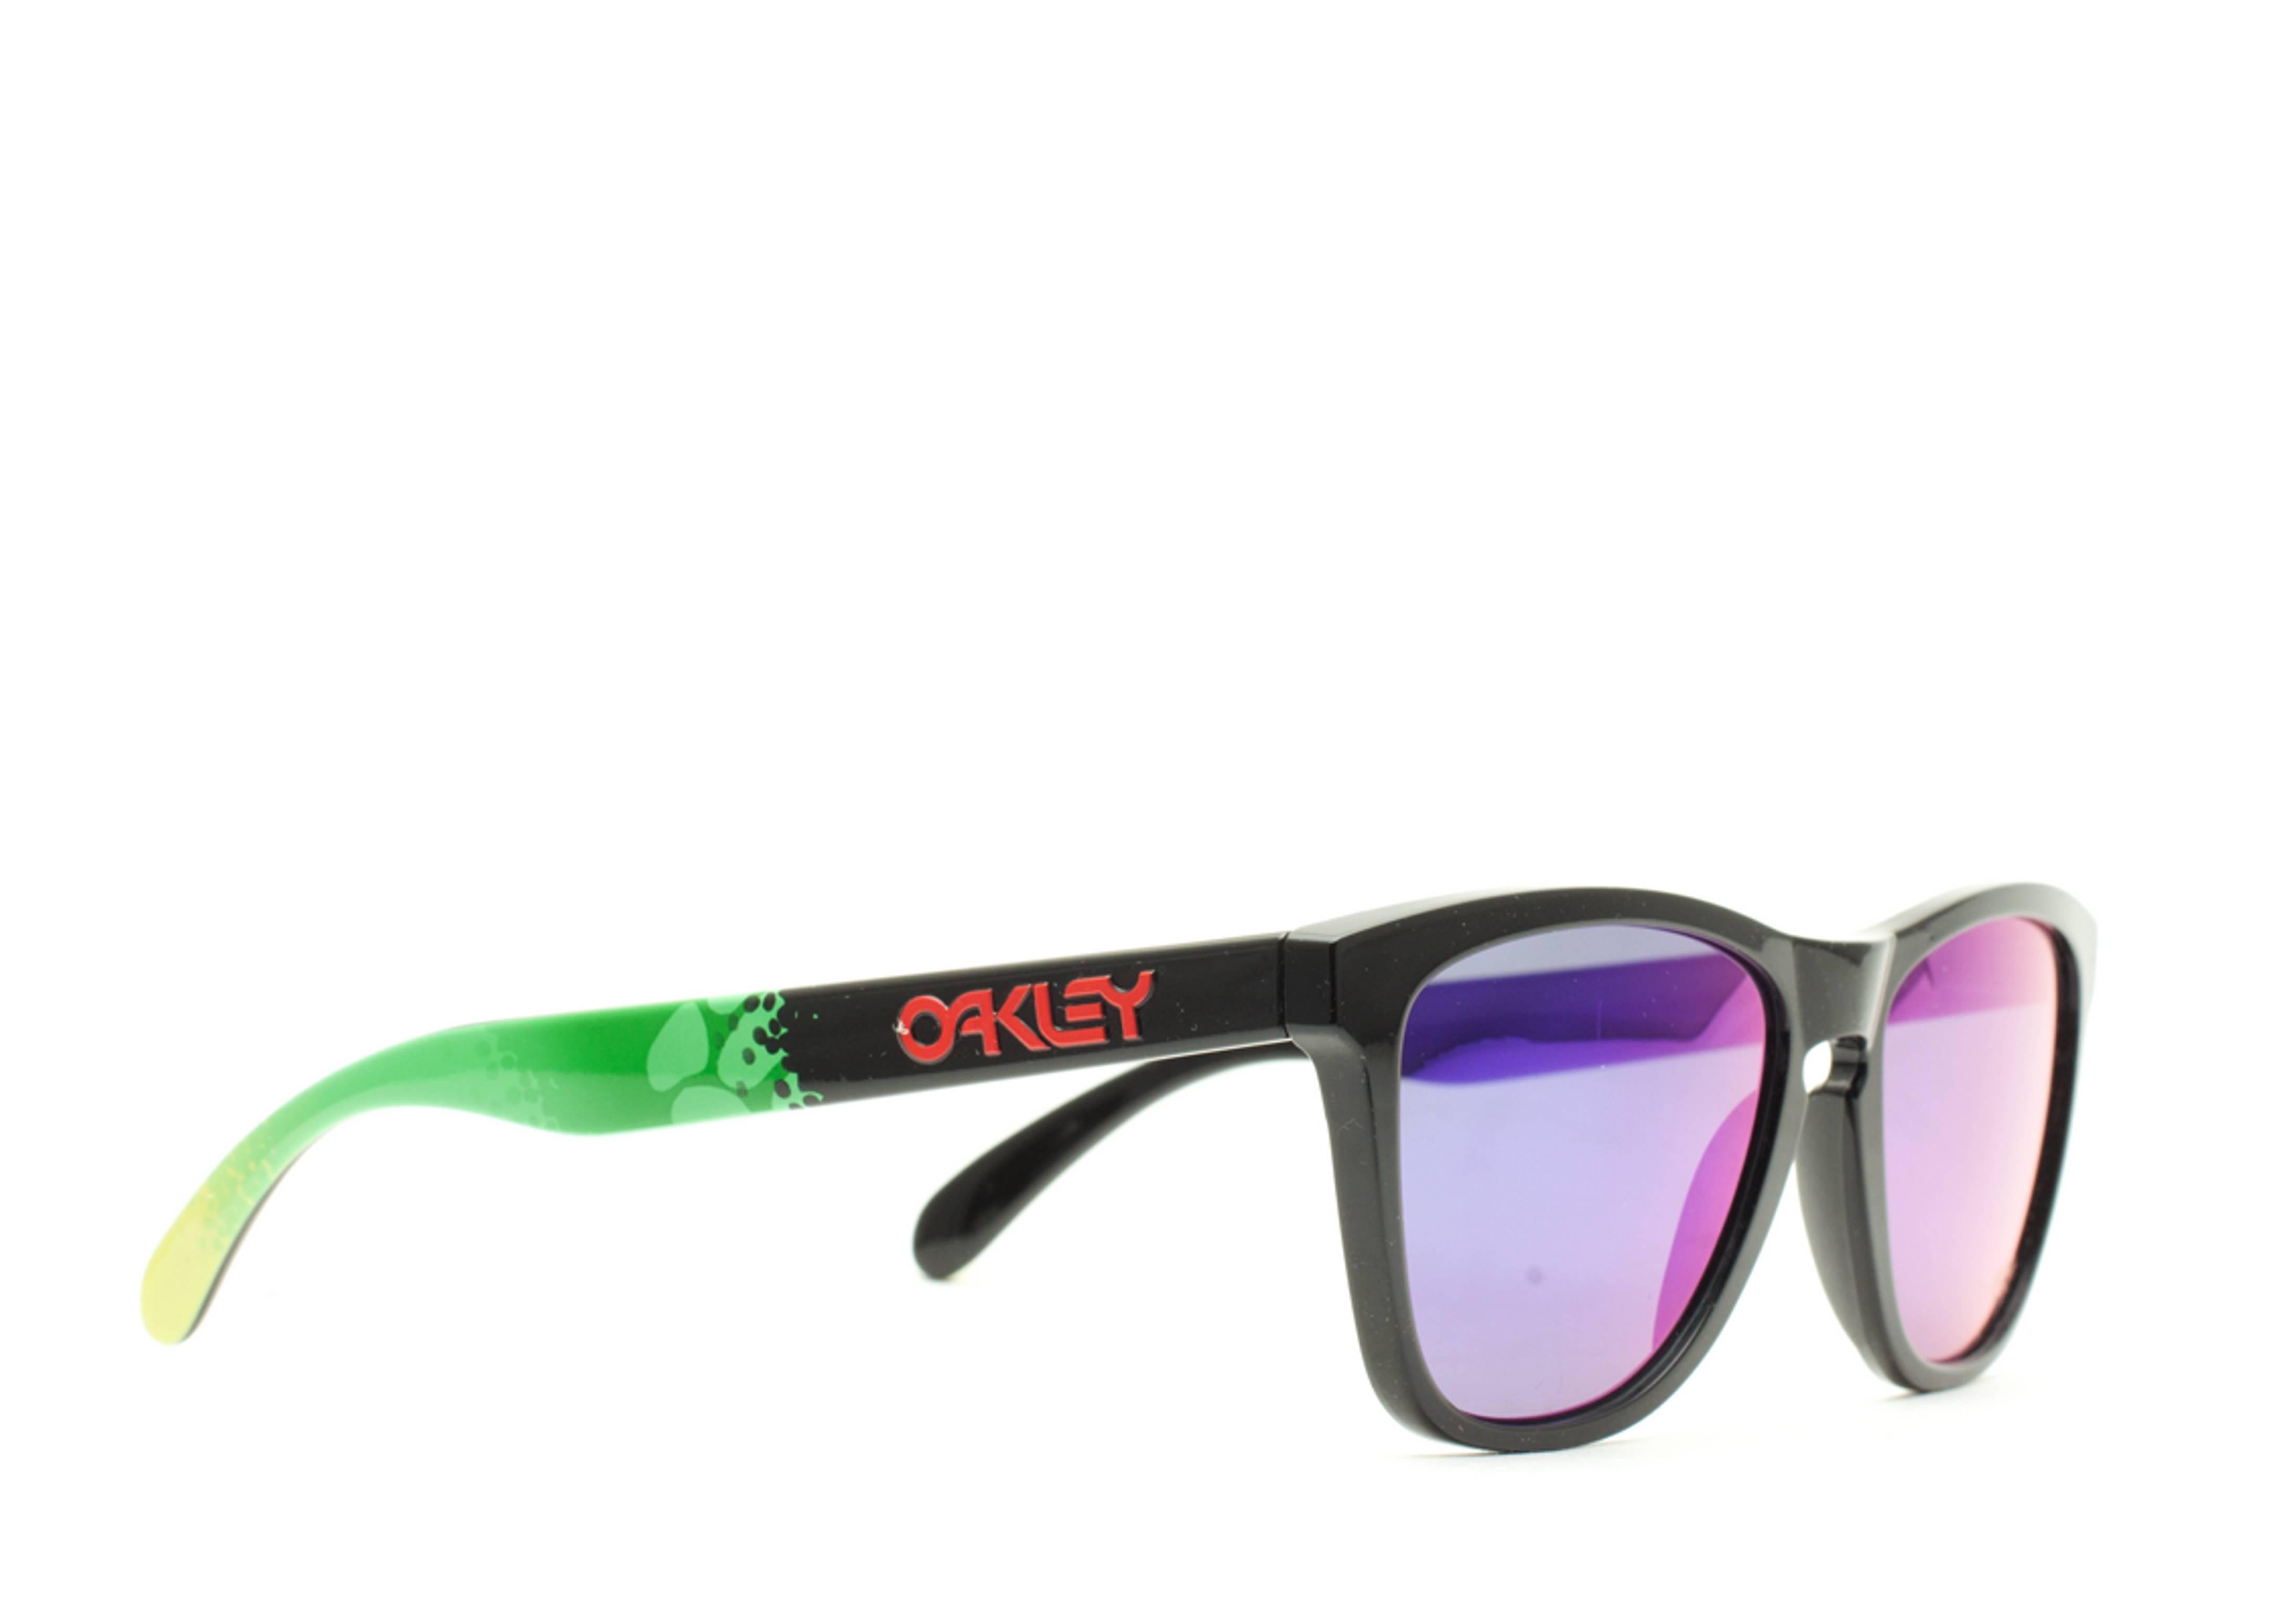 Oakley Frog Skins Red Iridium Lenses « Heritage Malta 6b01637dd73b